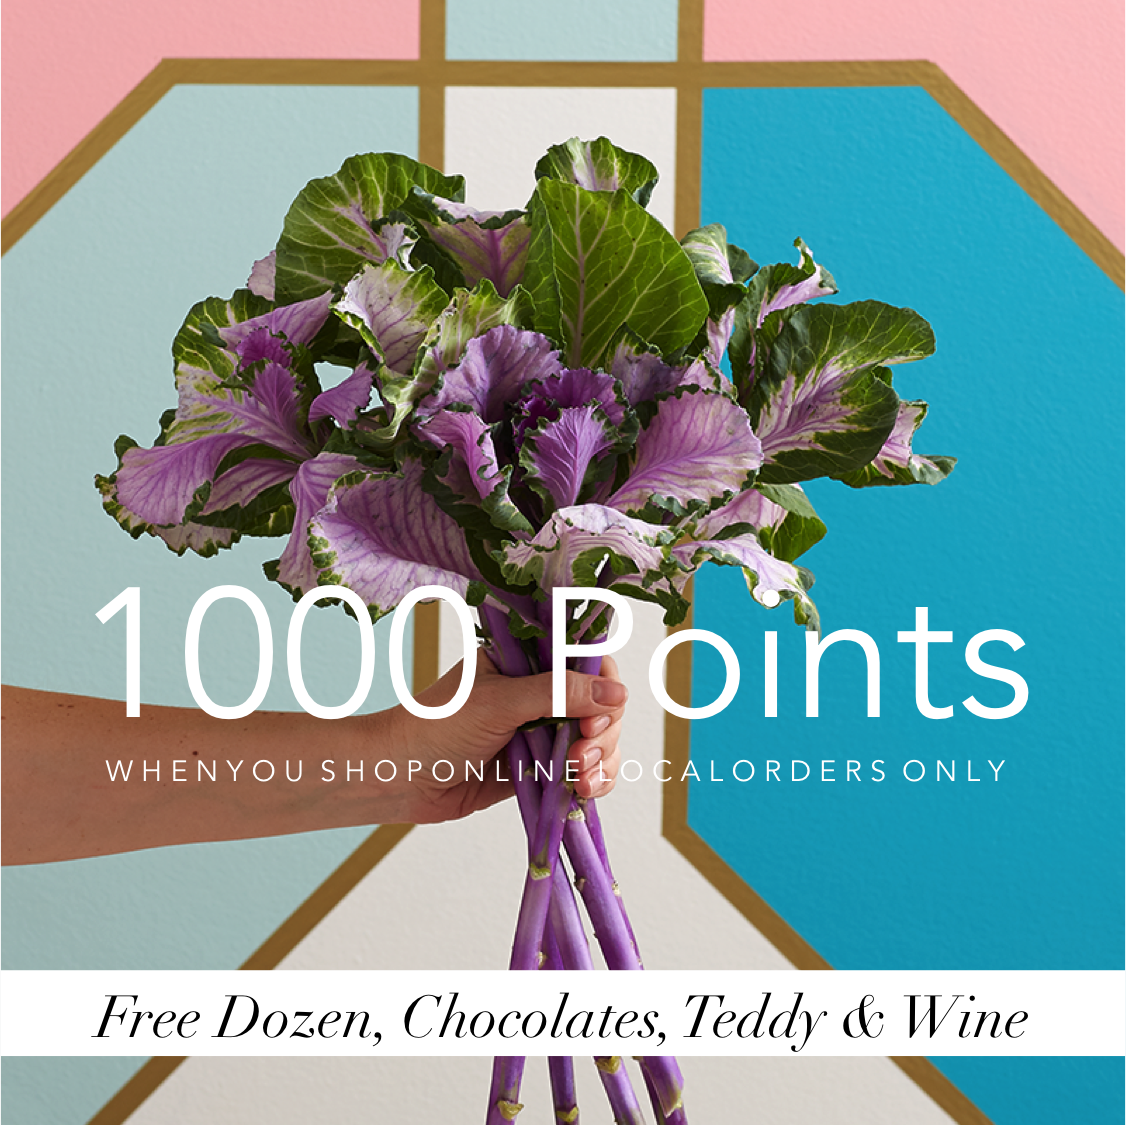 reward-points-4-angie-s-floral-designs-el-paso-florist-floreria-el-paso-angie-s-floral-designs-shop-flowers-online-el-paso-delivery-.png